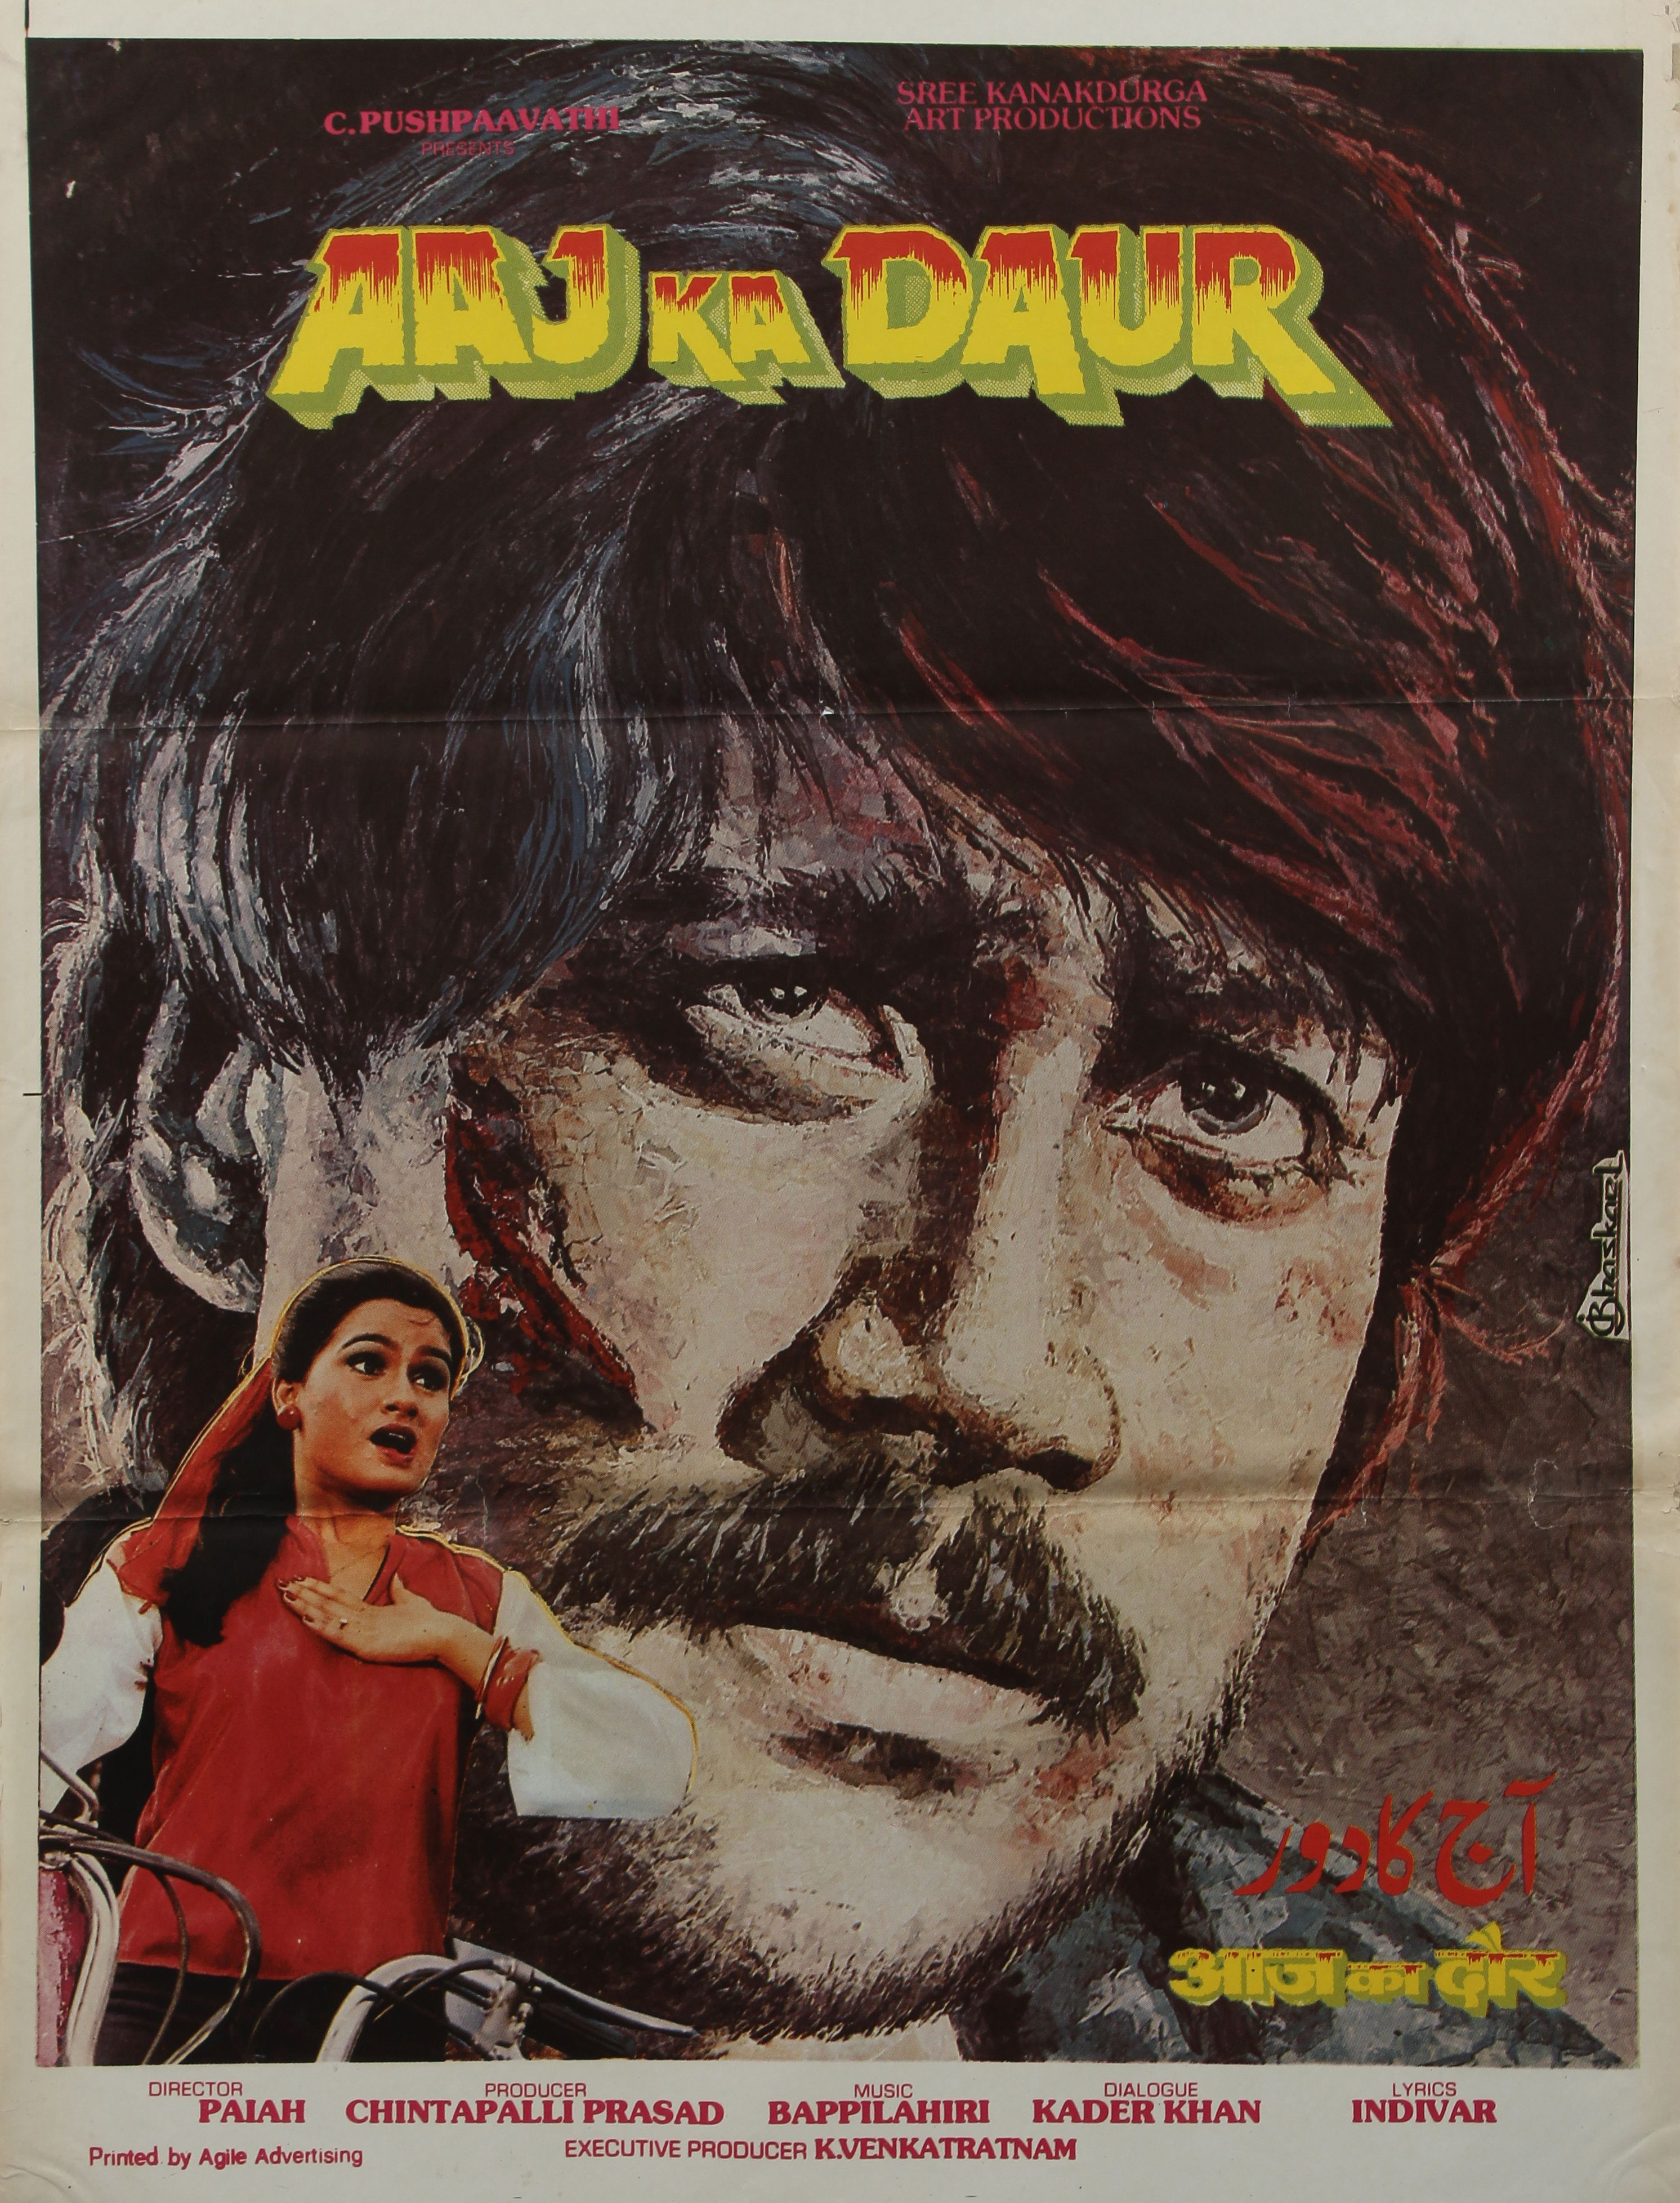 yaar gaddar full movie download khatrimaza